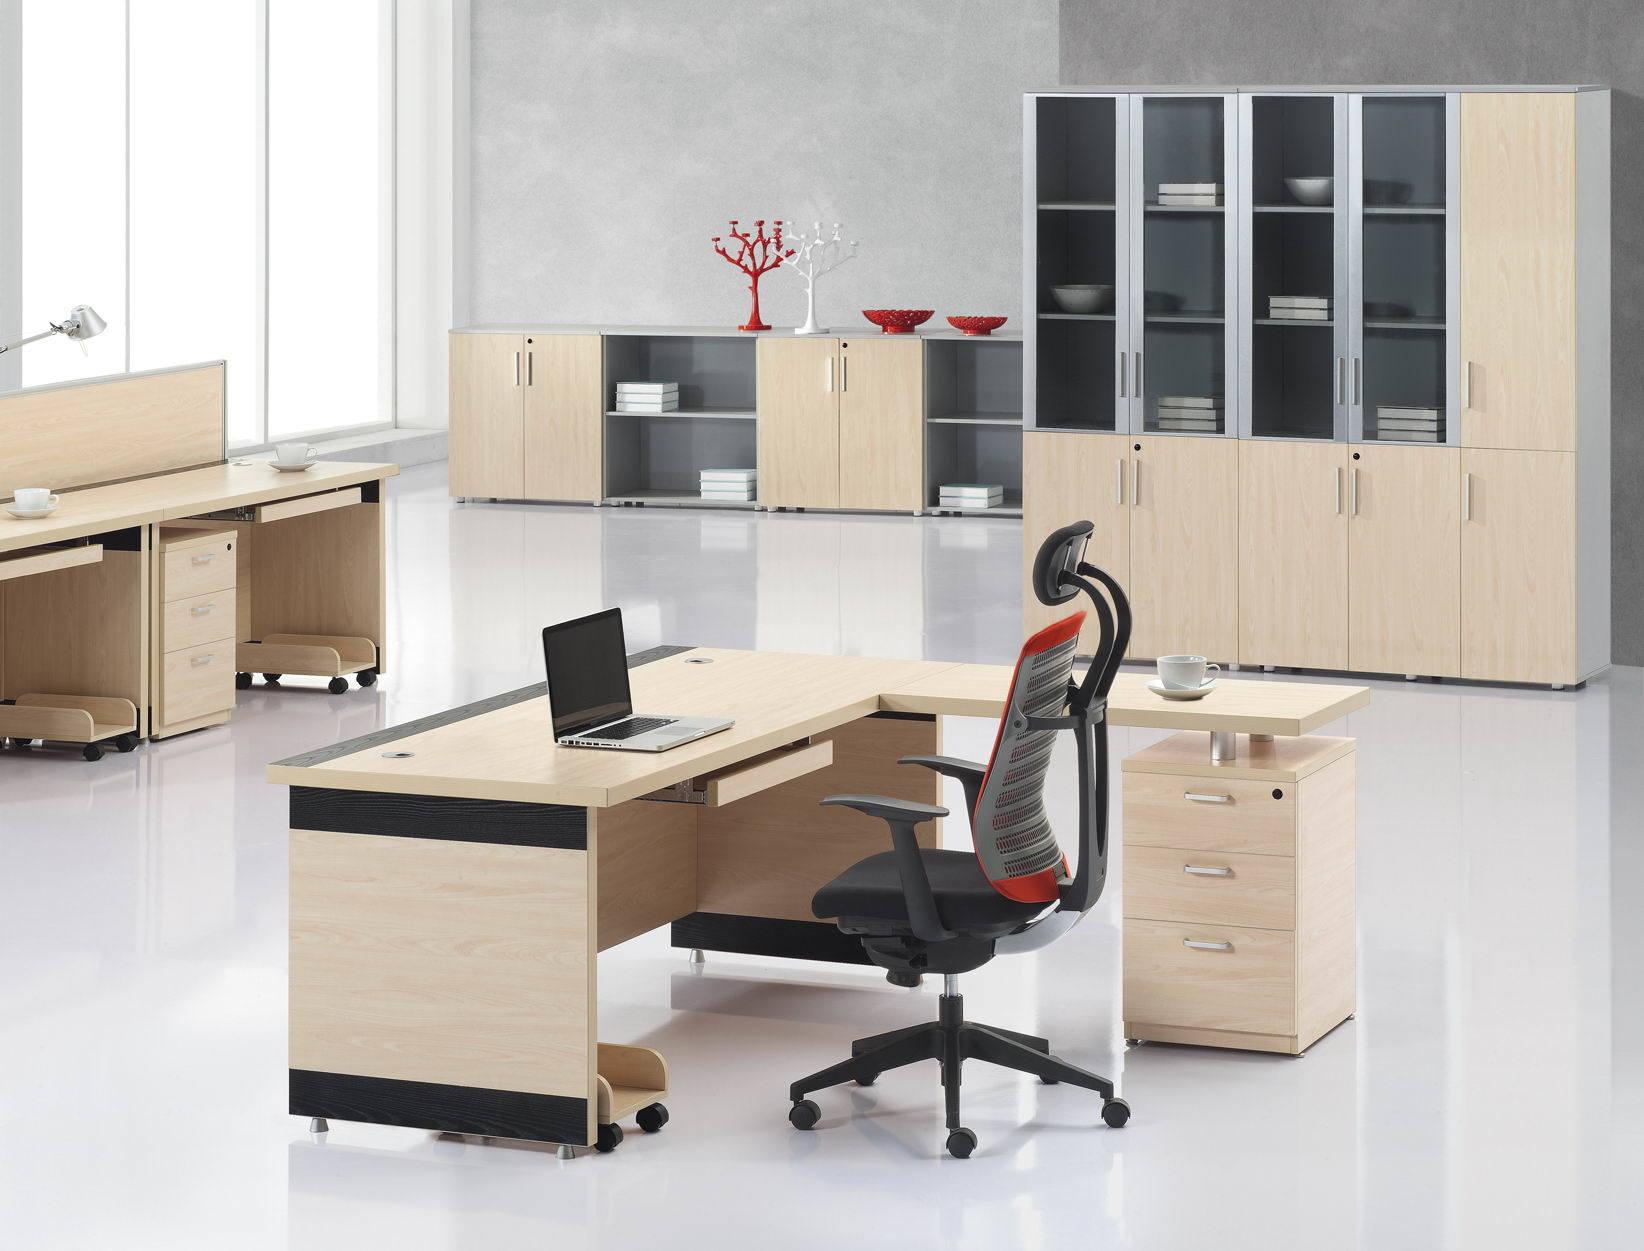 Muebles Modernos Para Oficina Oficlass Muebles De Oficna  # Baos Muebles De Oficina